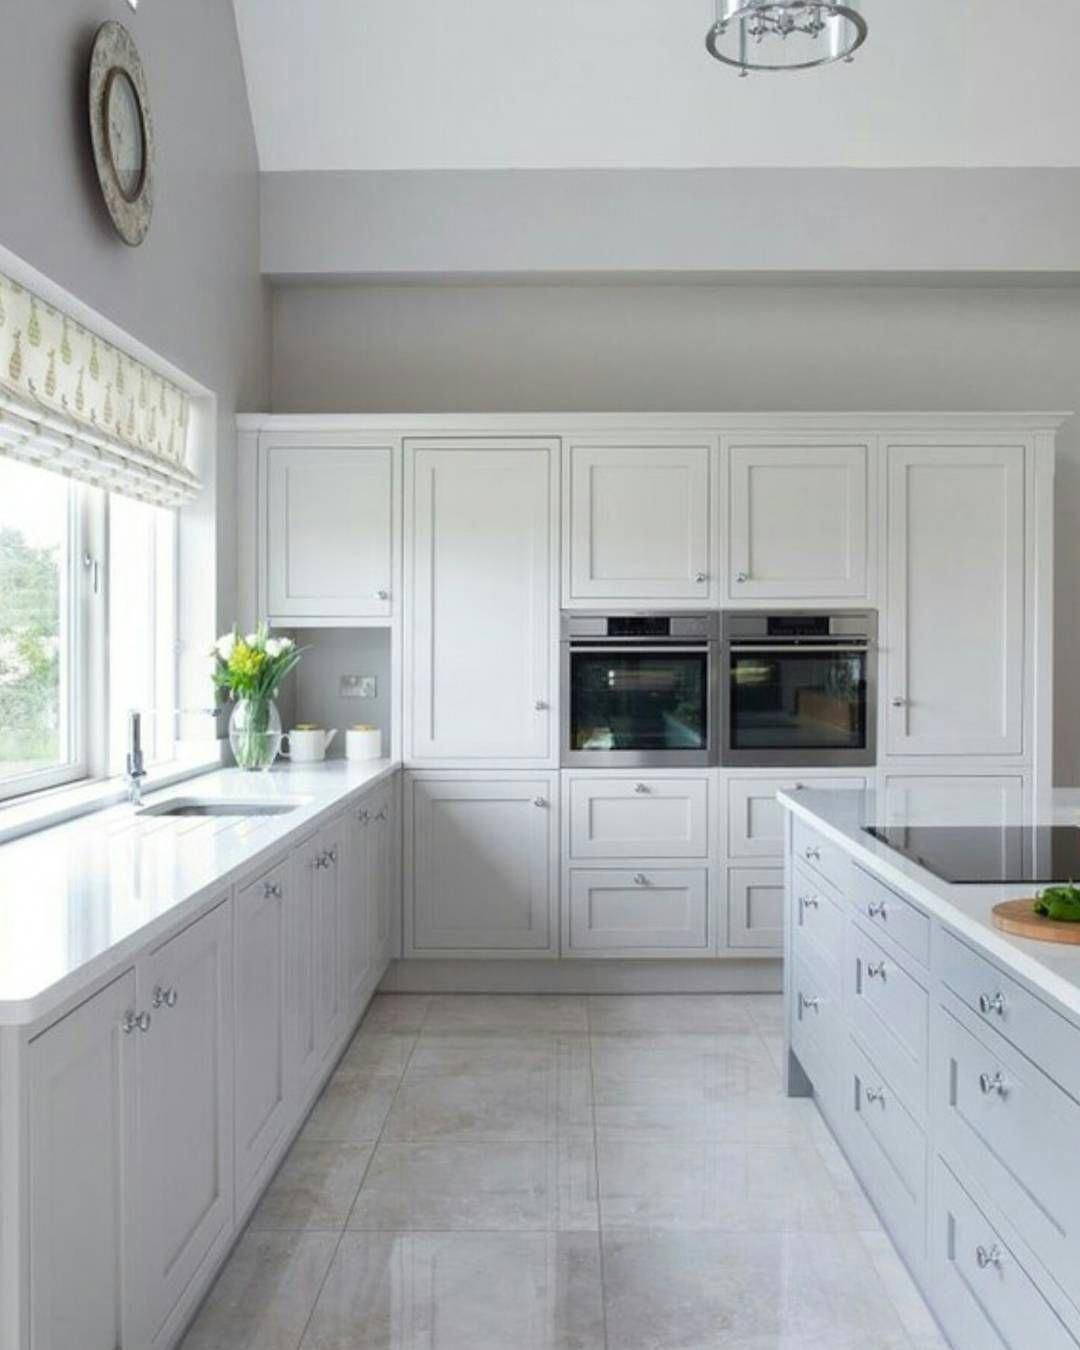 Period Kitchens Designs Renovation: Categorymodern Home Decor Ideas - SalePrice:41$